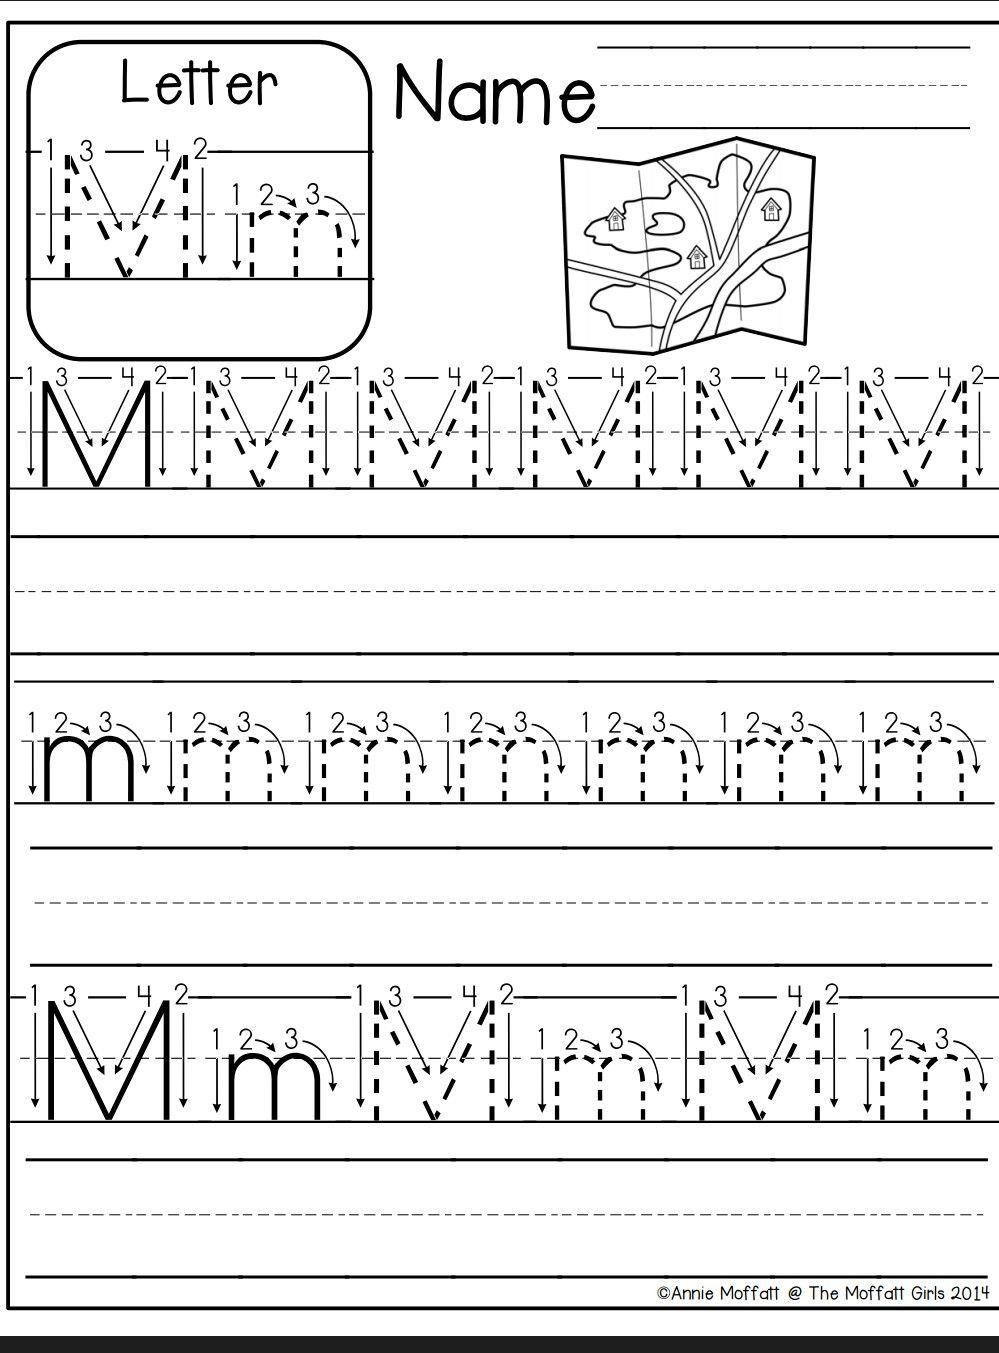 Letter M Worksheet | Kindergarten Abc Worksheets, Alphabet